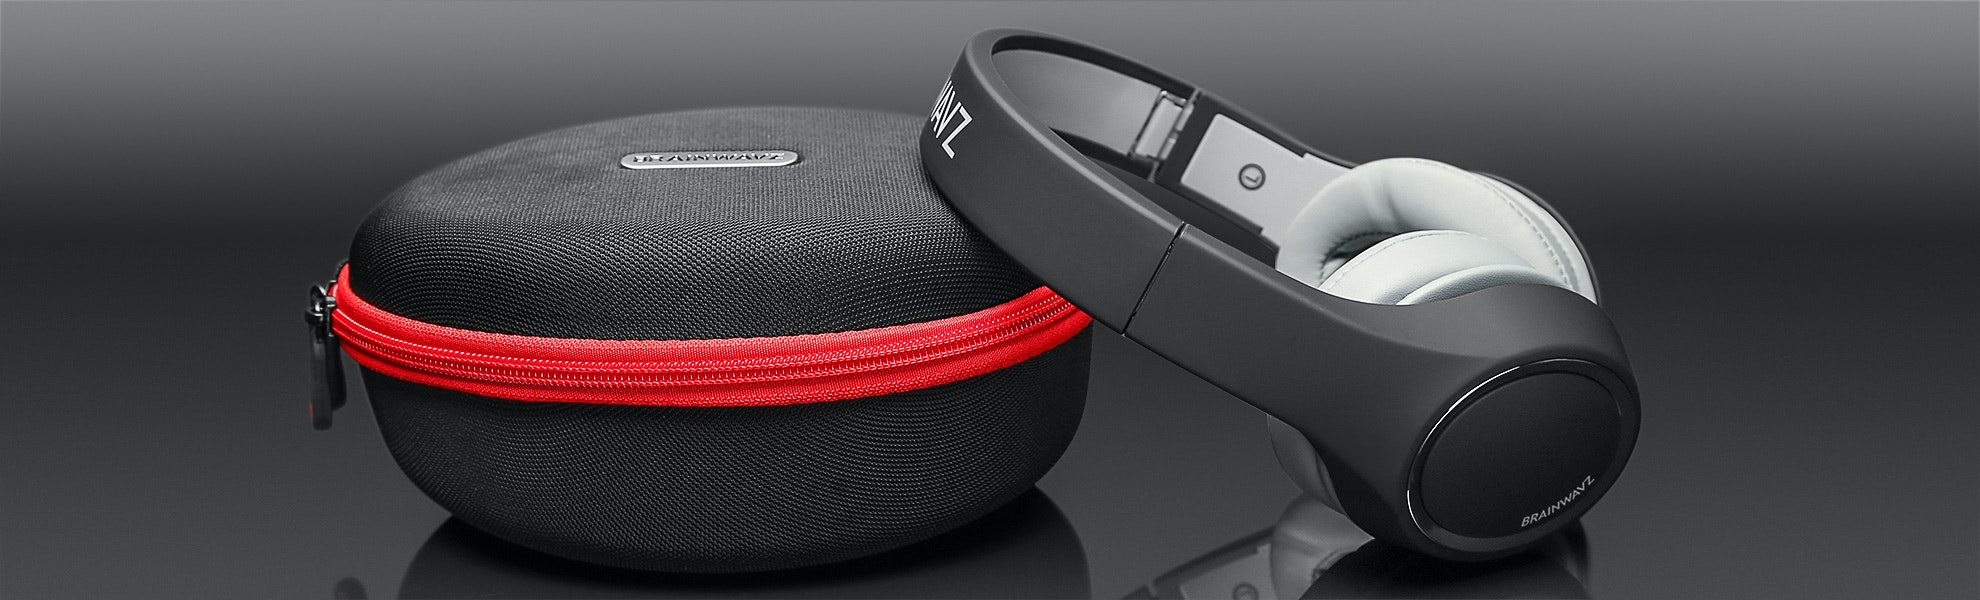 Brainwavz HM2 Portable Headphones